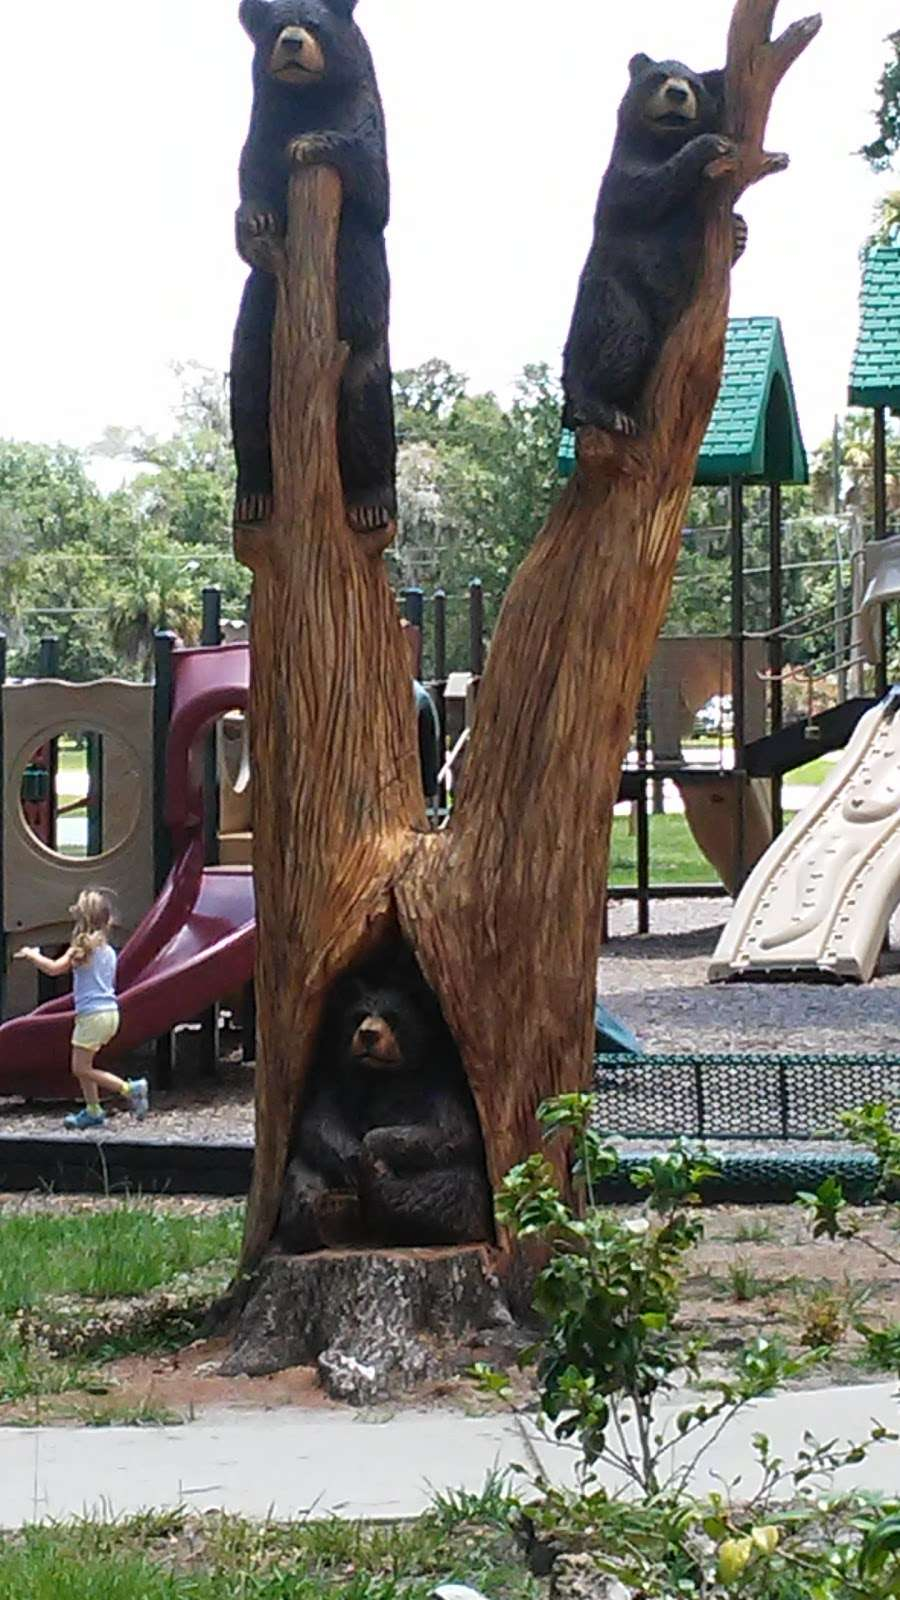 Cadwell Park - park  | Photo 2 of 10 | Address: 1 Cassady St, Umatilla, FL 32784, USA